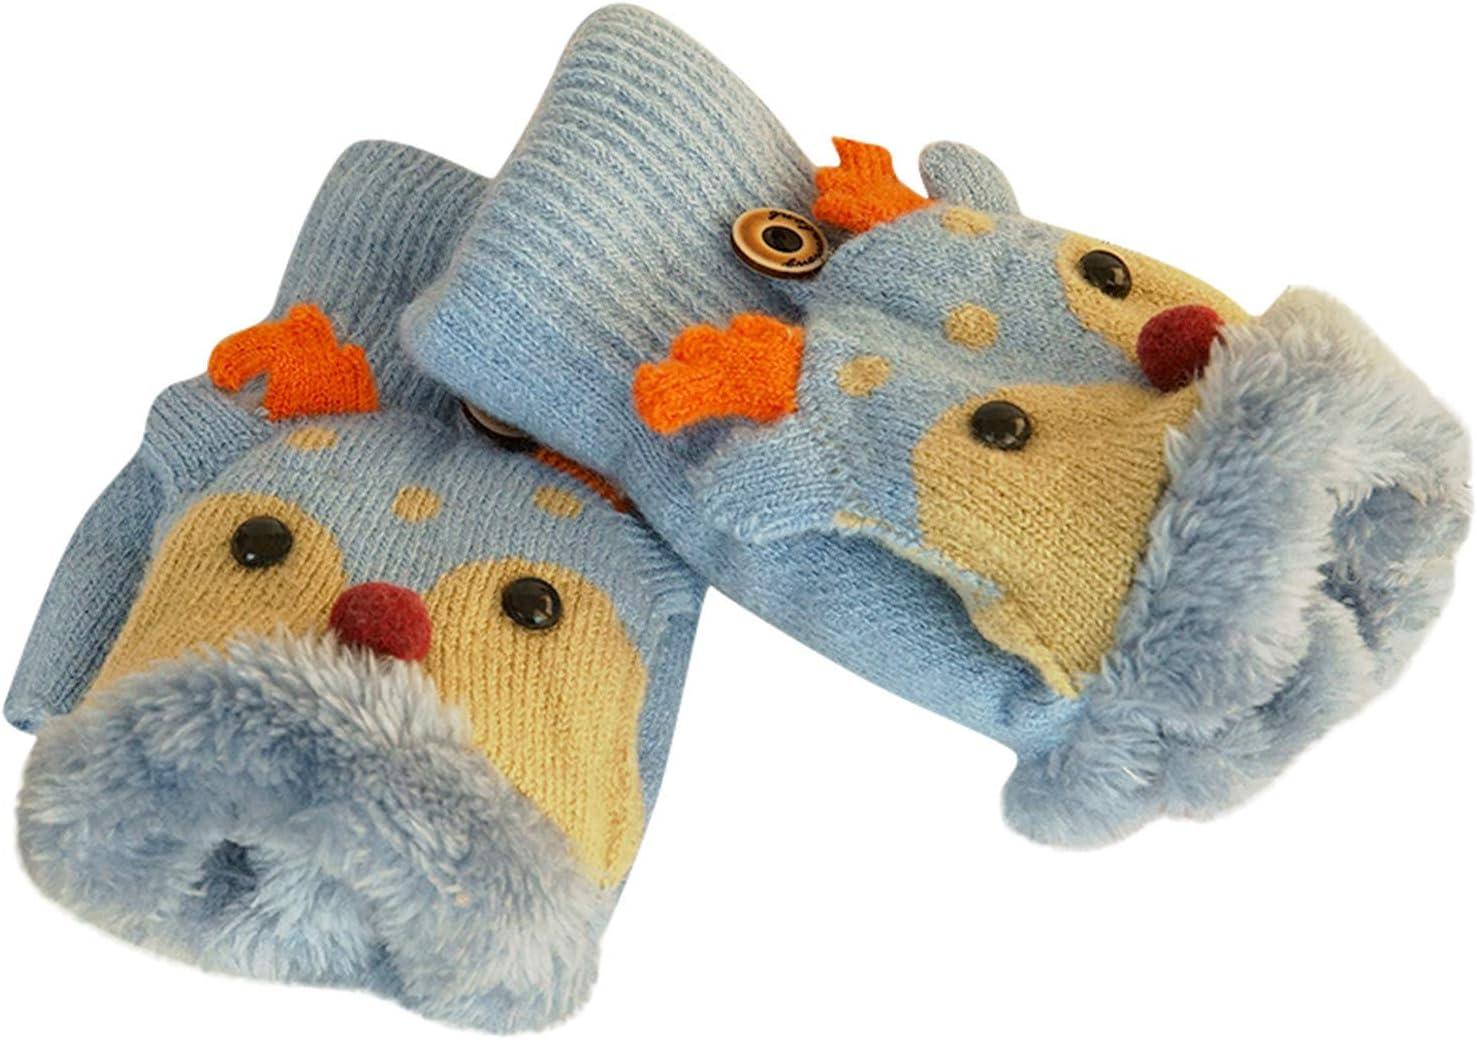 Children's Winter Gloves New Cute Winter Warm Cashmere Knitted Clamshell Gloves (Light Blue)